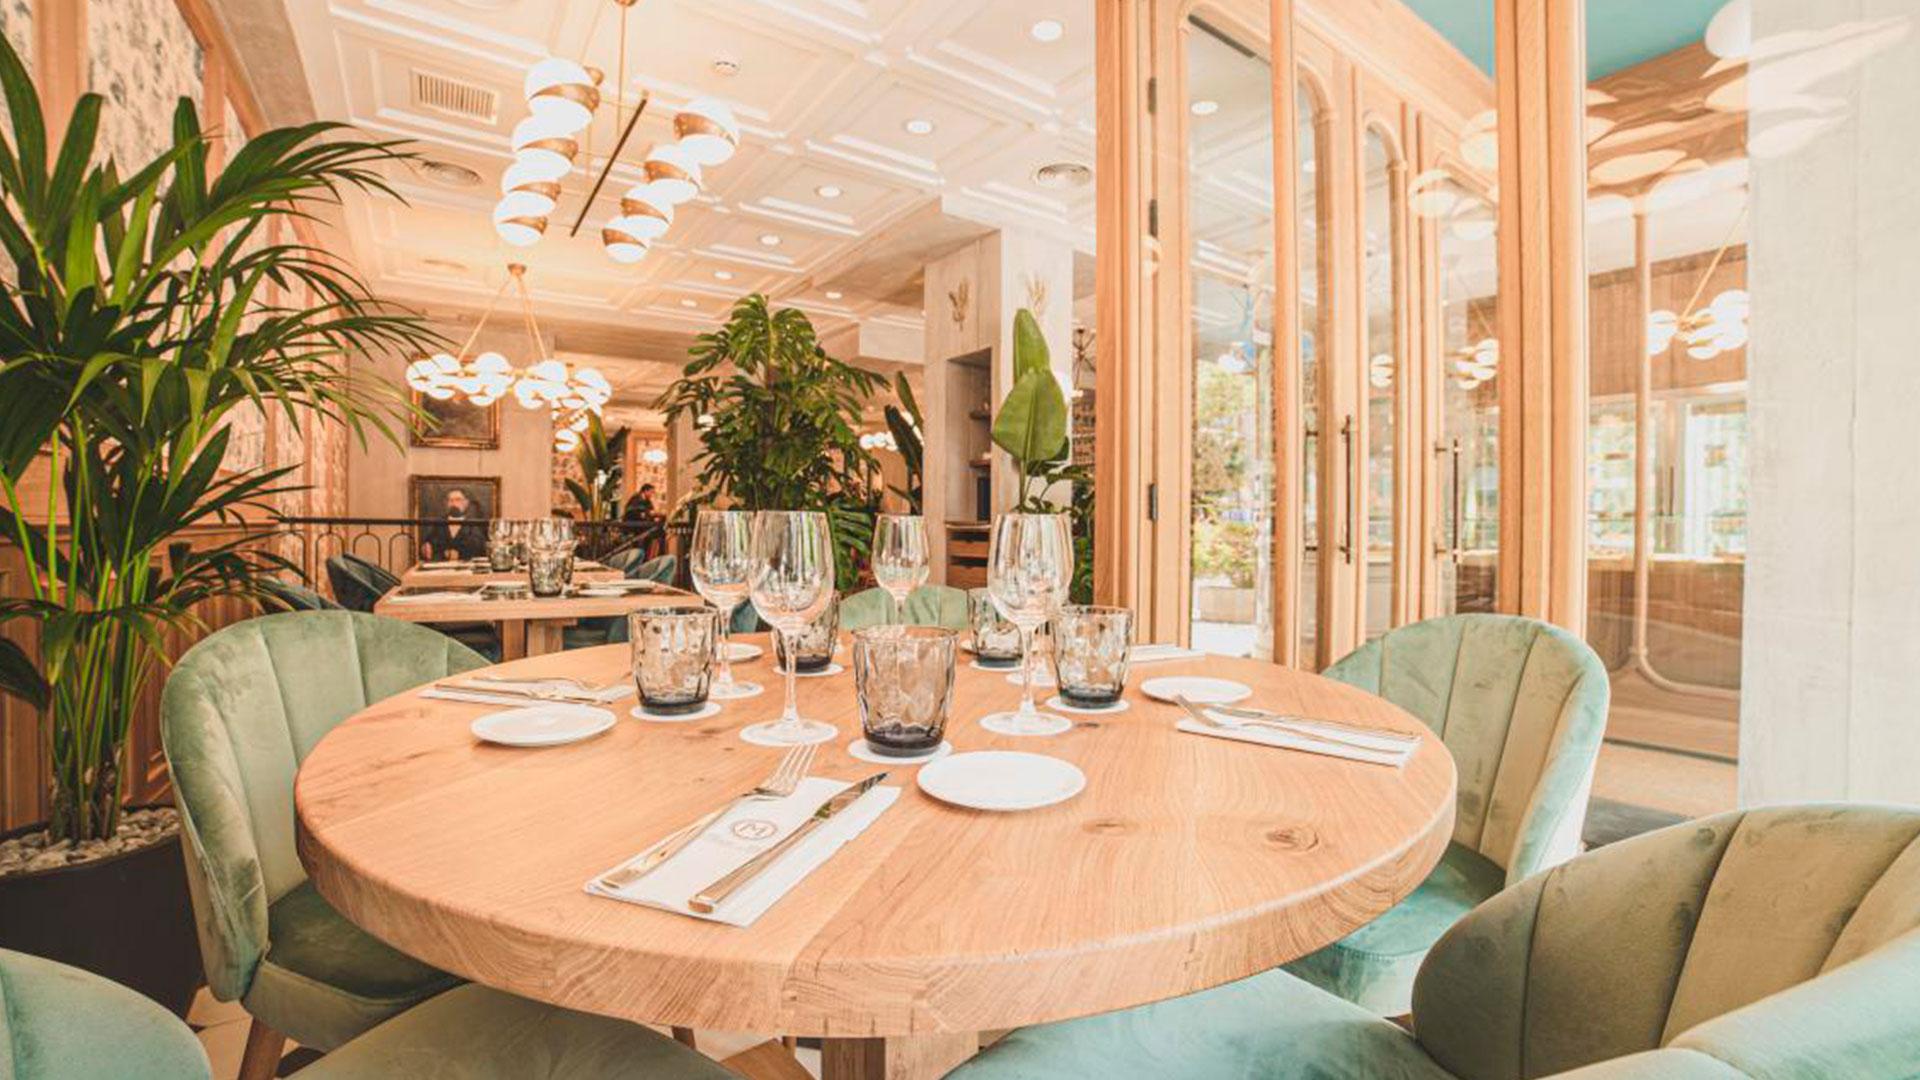 Un café parisien en el centro de Madrid hero asset